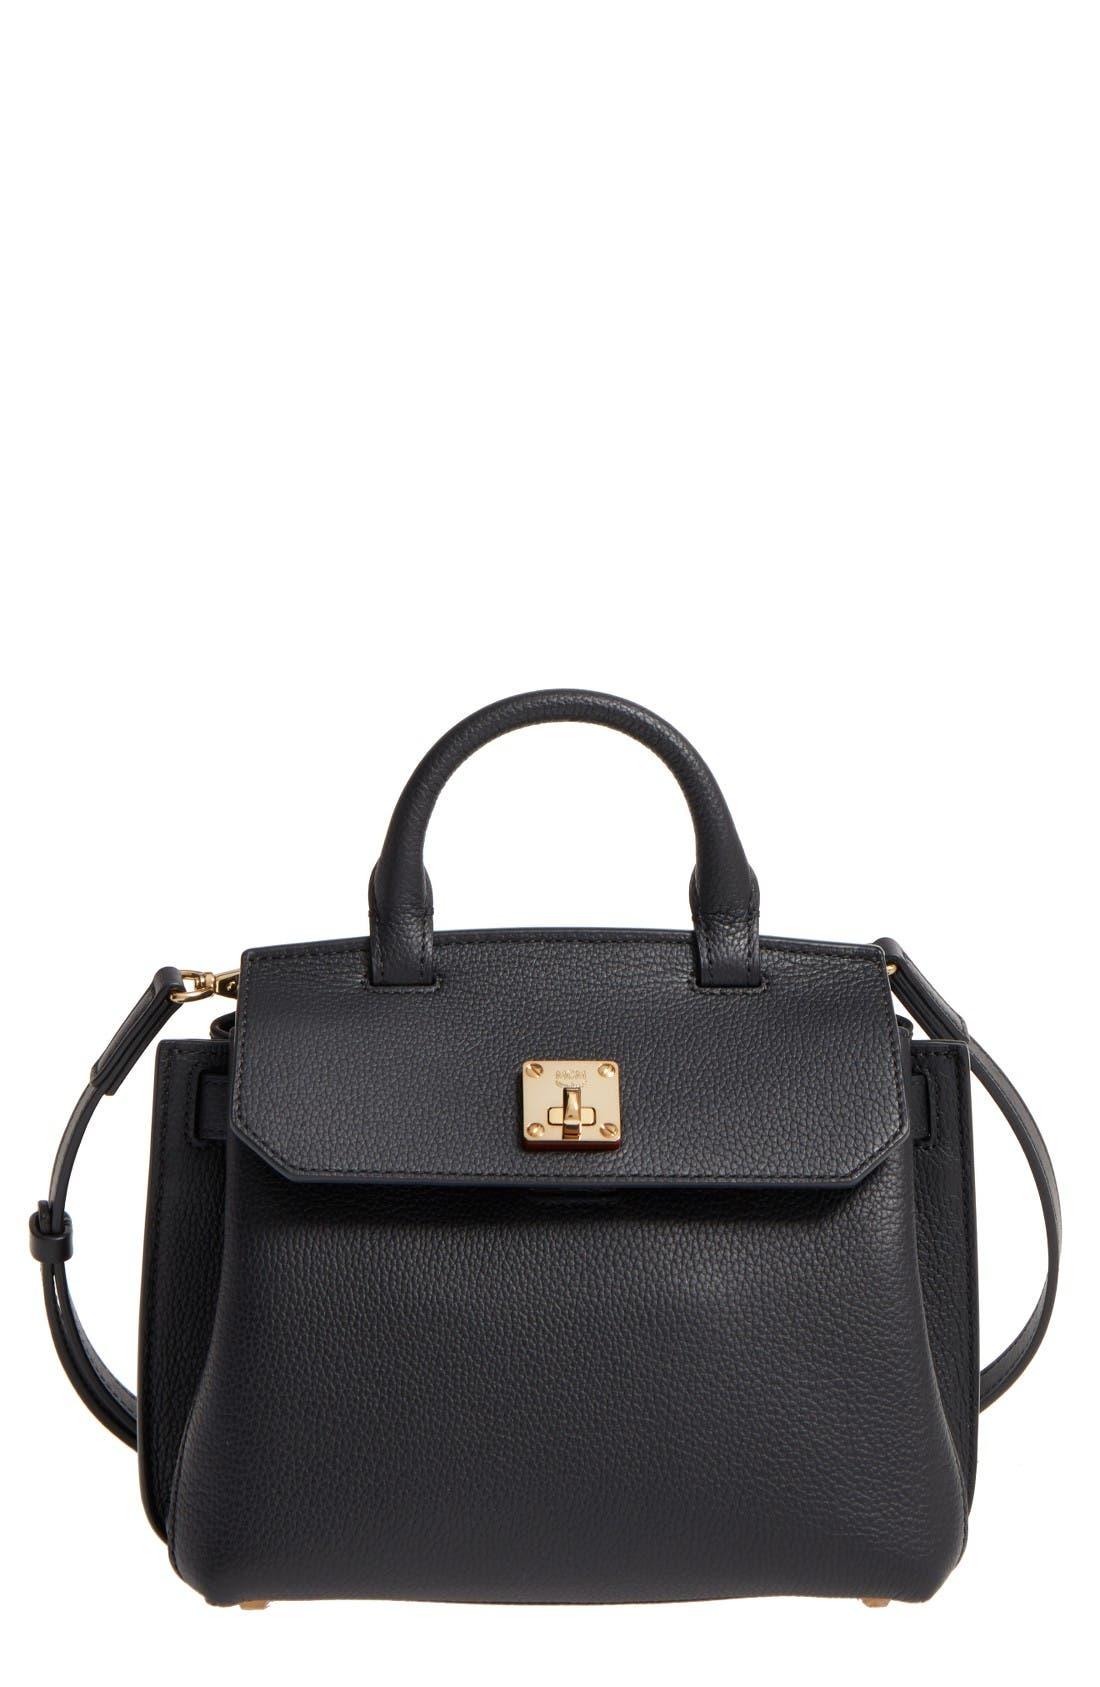 MCM Milla Leather Crossbody Bag